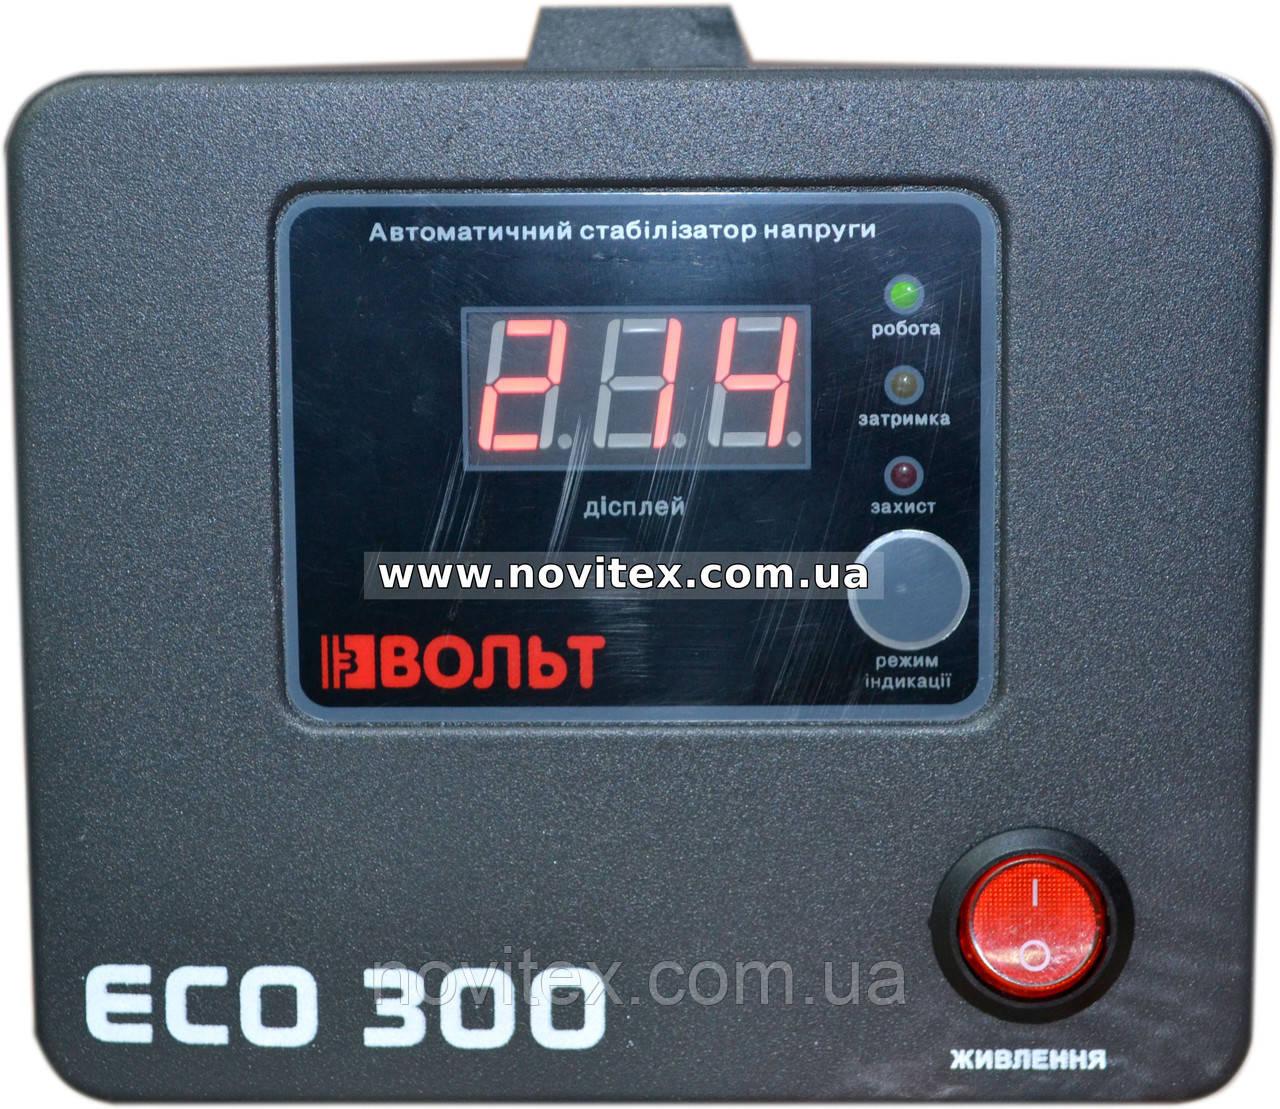 Стабилизатор Вольт ECO-300, фото 1